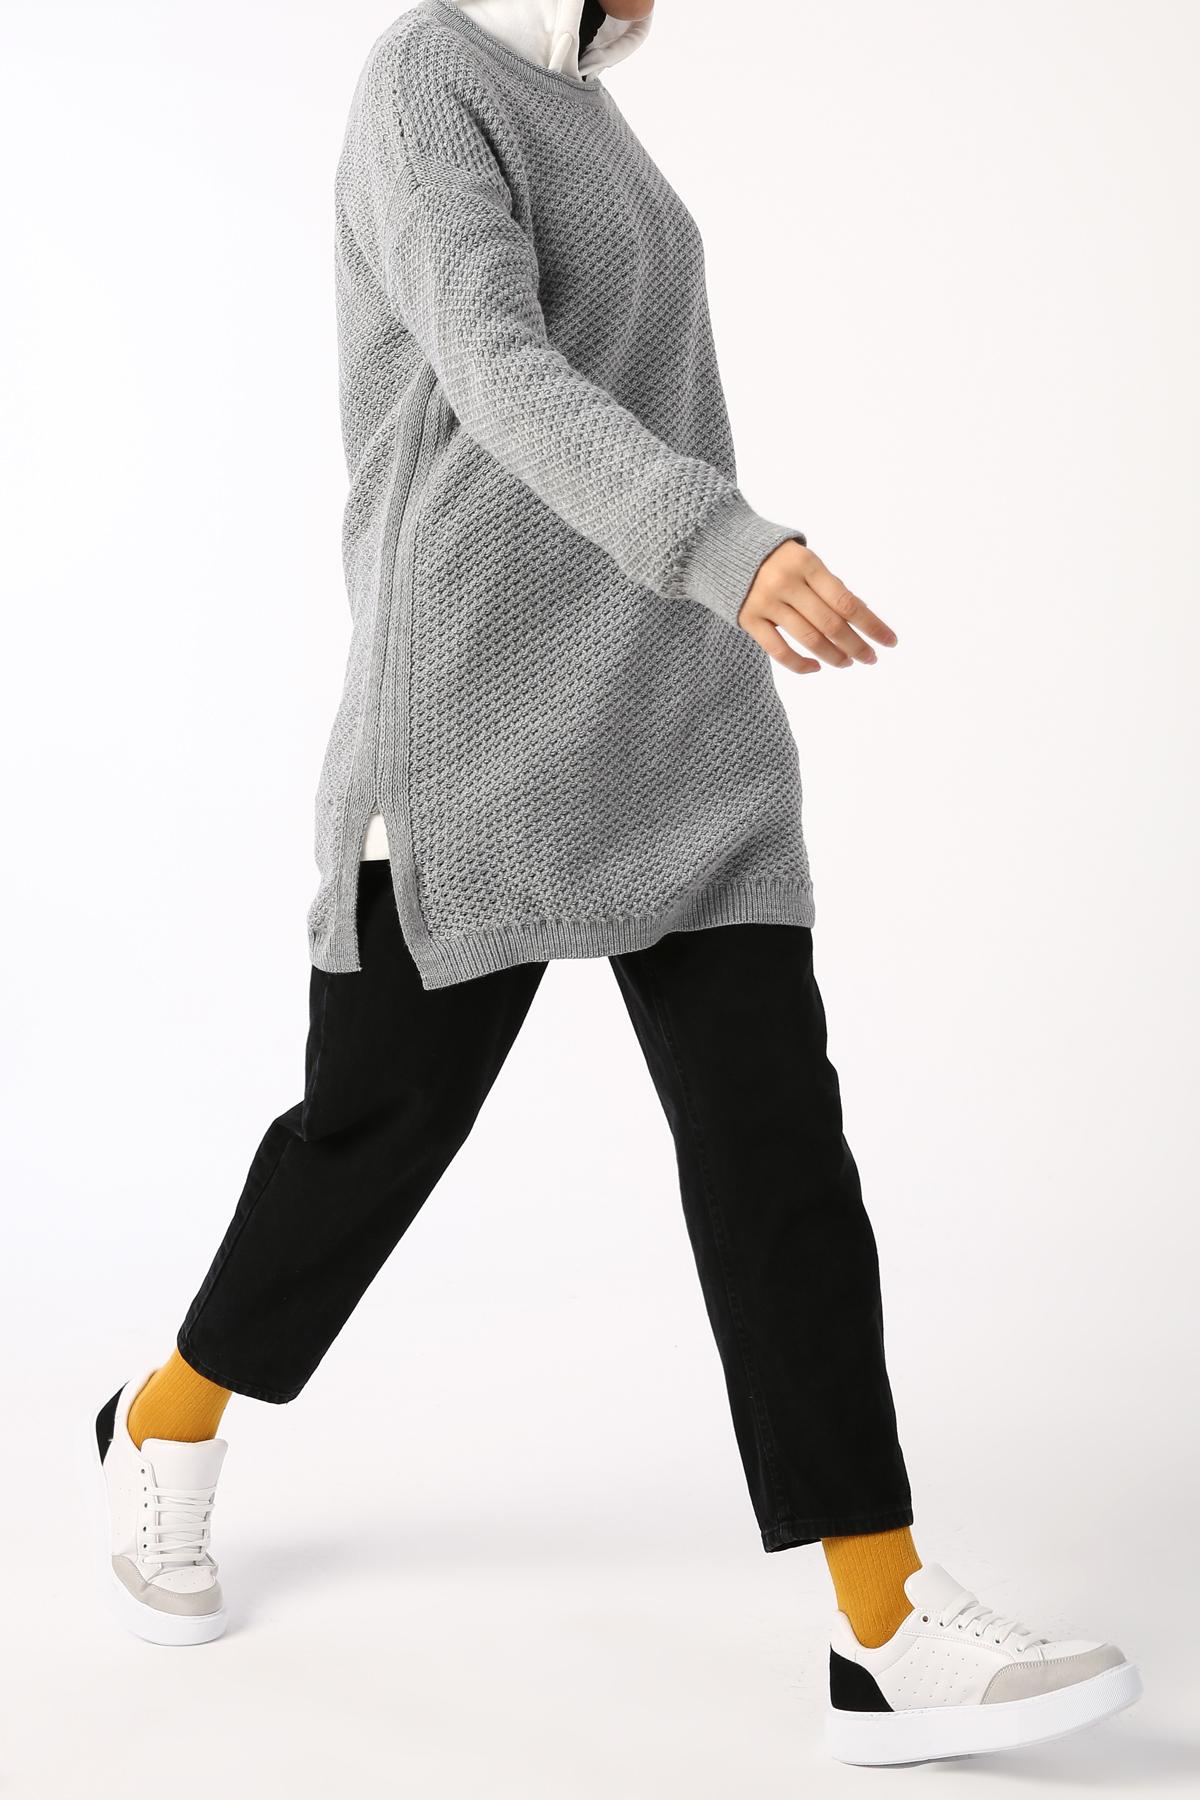 Crew Neck Knitwear Sheer Tunic